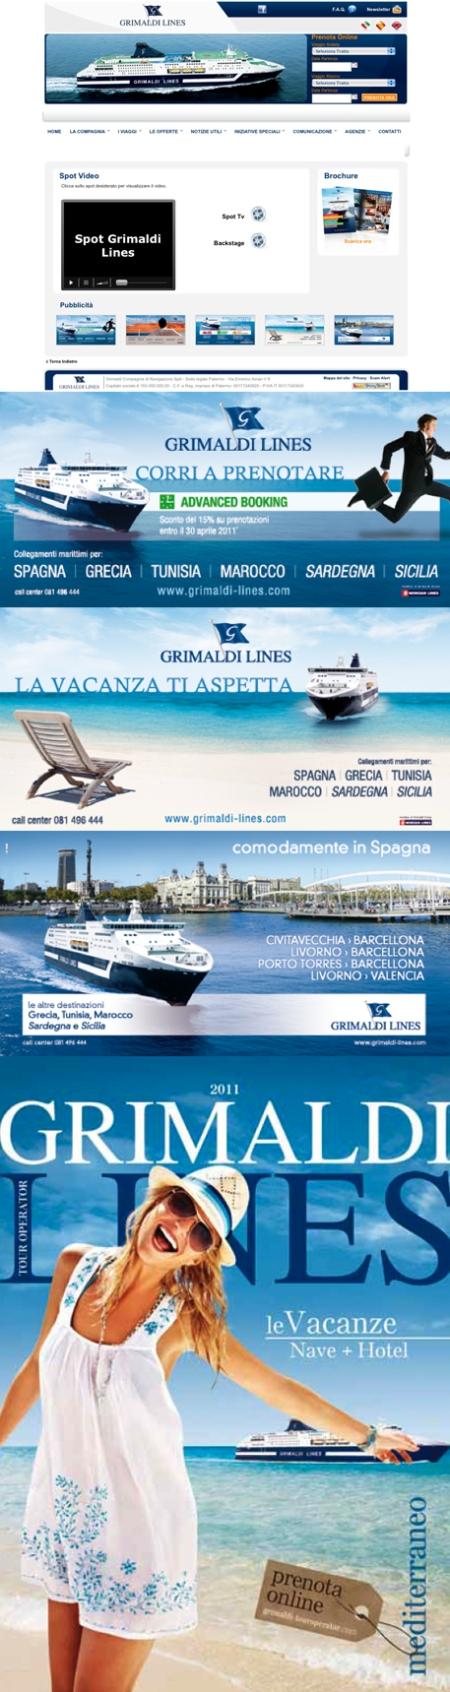 Grimaldi Lines, Grimaldi Lines 2011, Grimaldi Lines cruceros, Grimaldi Lines retoque photoshop, katanga73, katanga73.wordpress.com, katarama